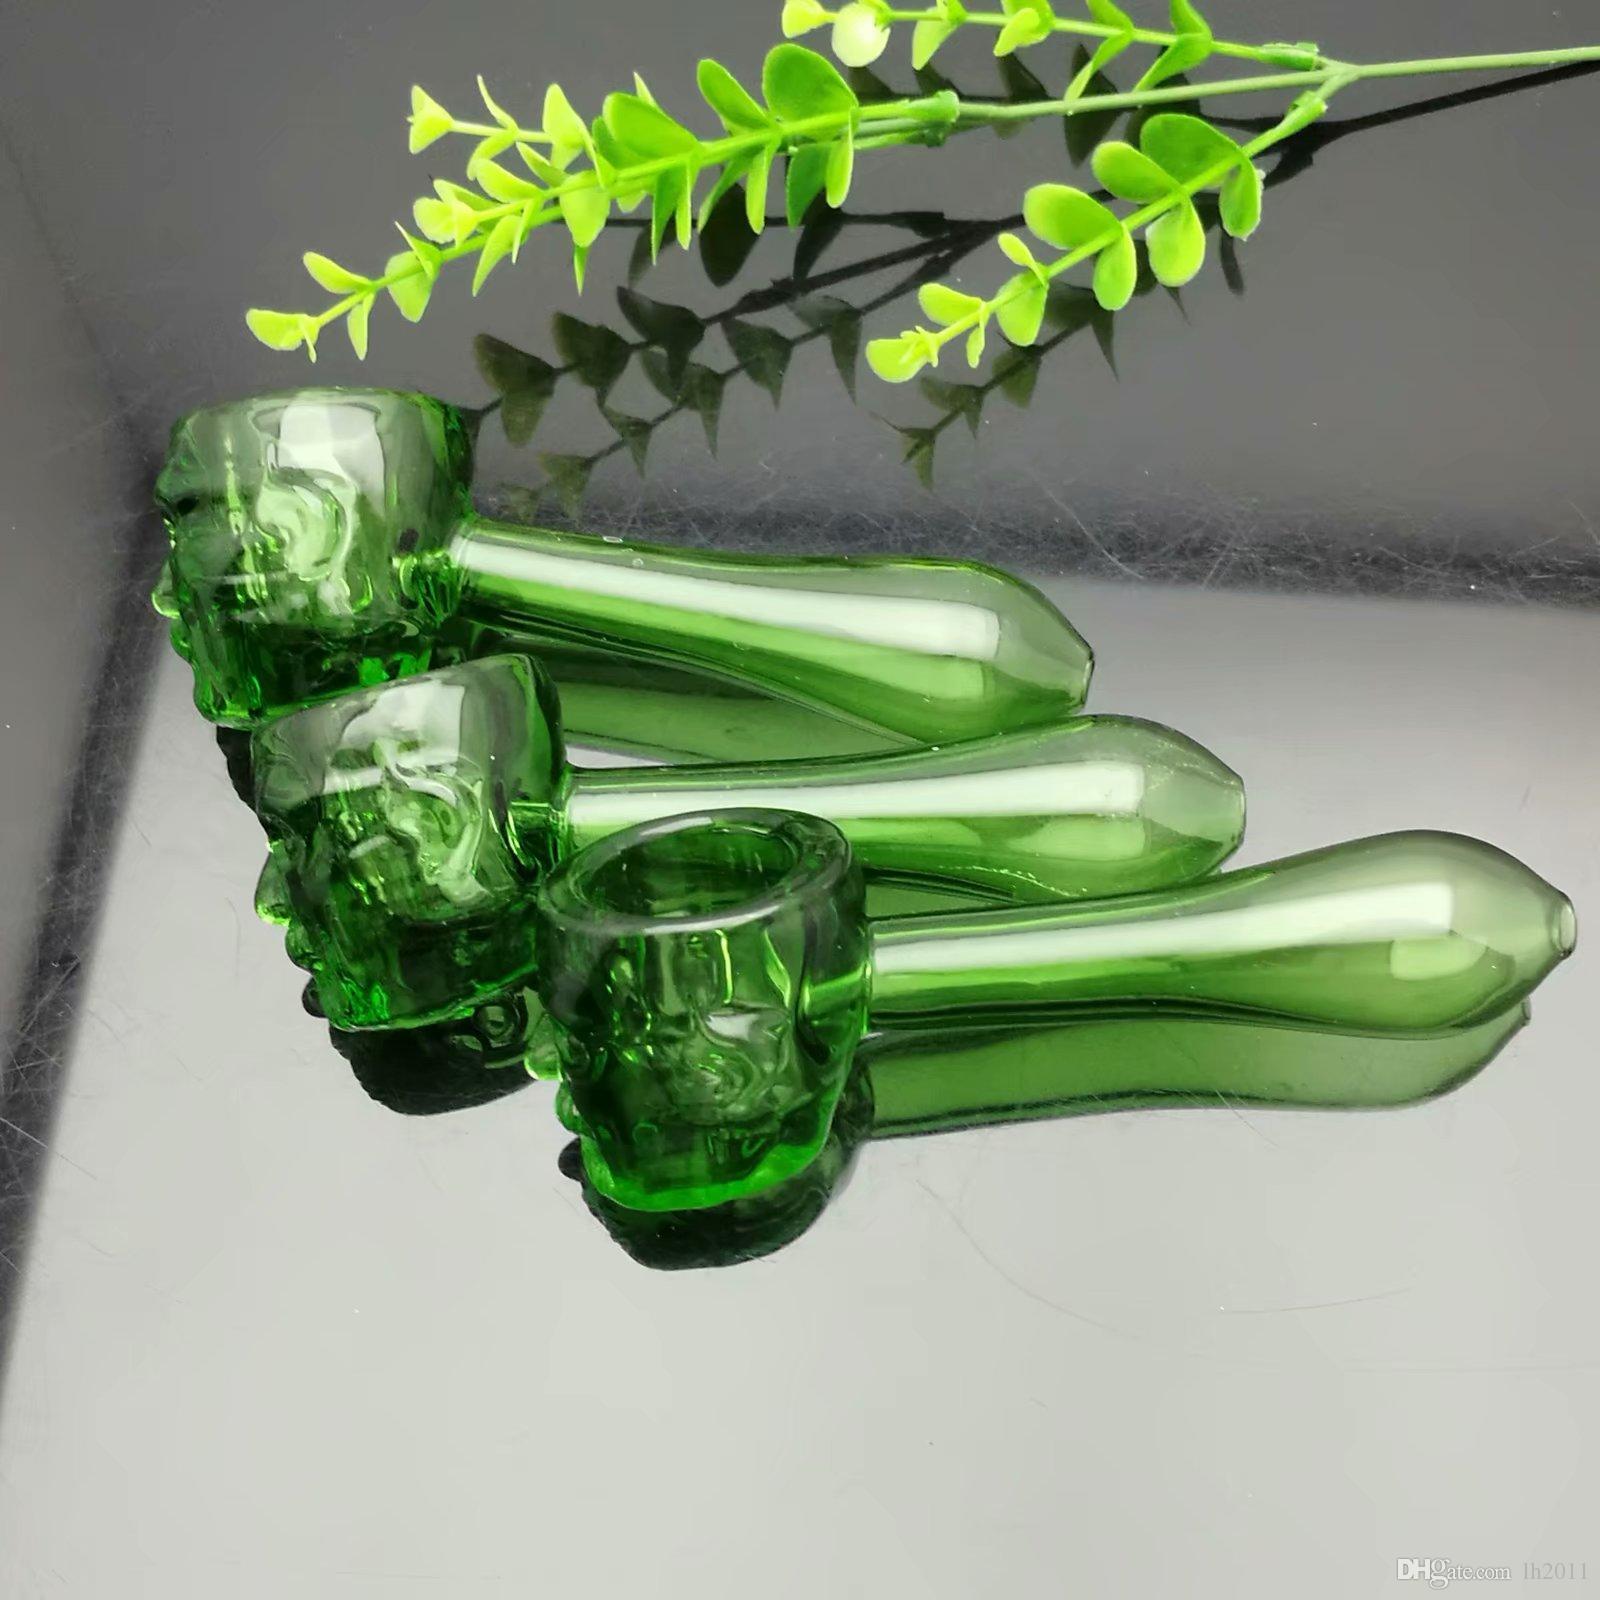 Nuevo fantasma verde tubo de vidrio Bongs de vidrio Quemador de aceite Vidrio Tubos de agua Plataformas petroleras No fumar